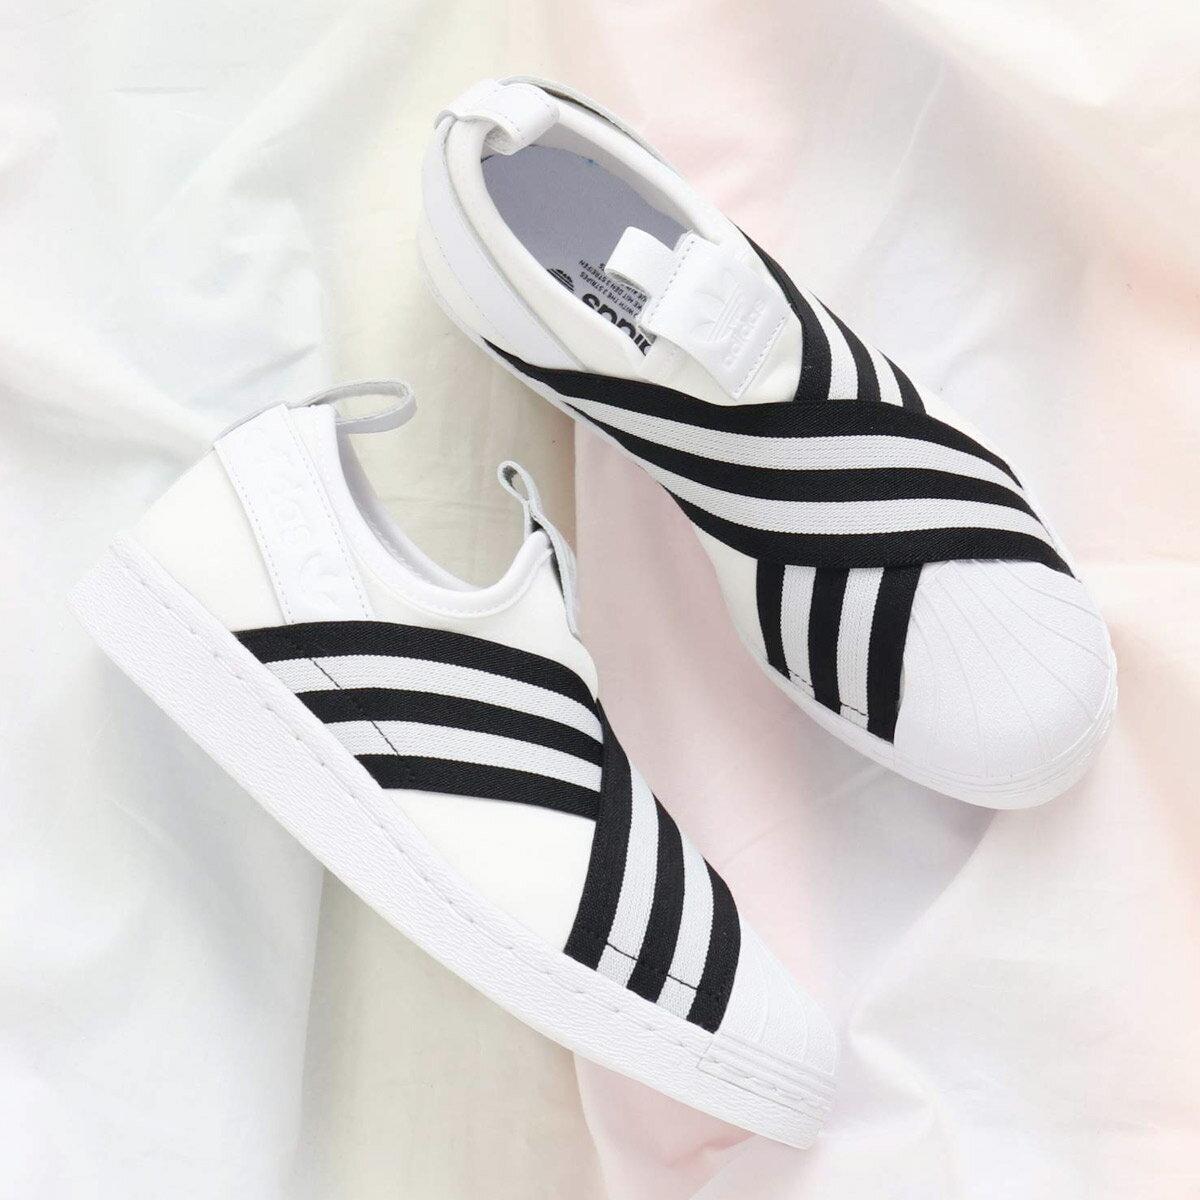 adidas Originals SUPERSTAR SLIPON W(アディダス オリジナルス スーパースタースリッポン W) Running White/Running White/Core Black18SS-I